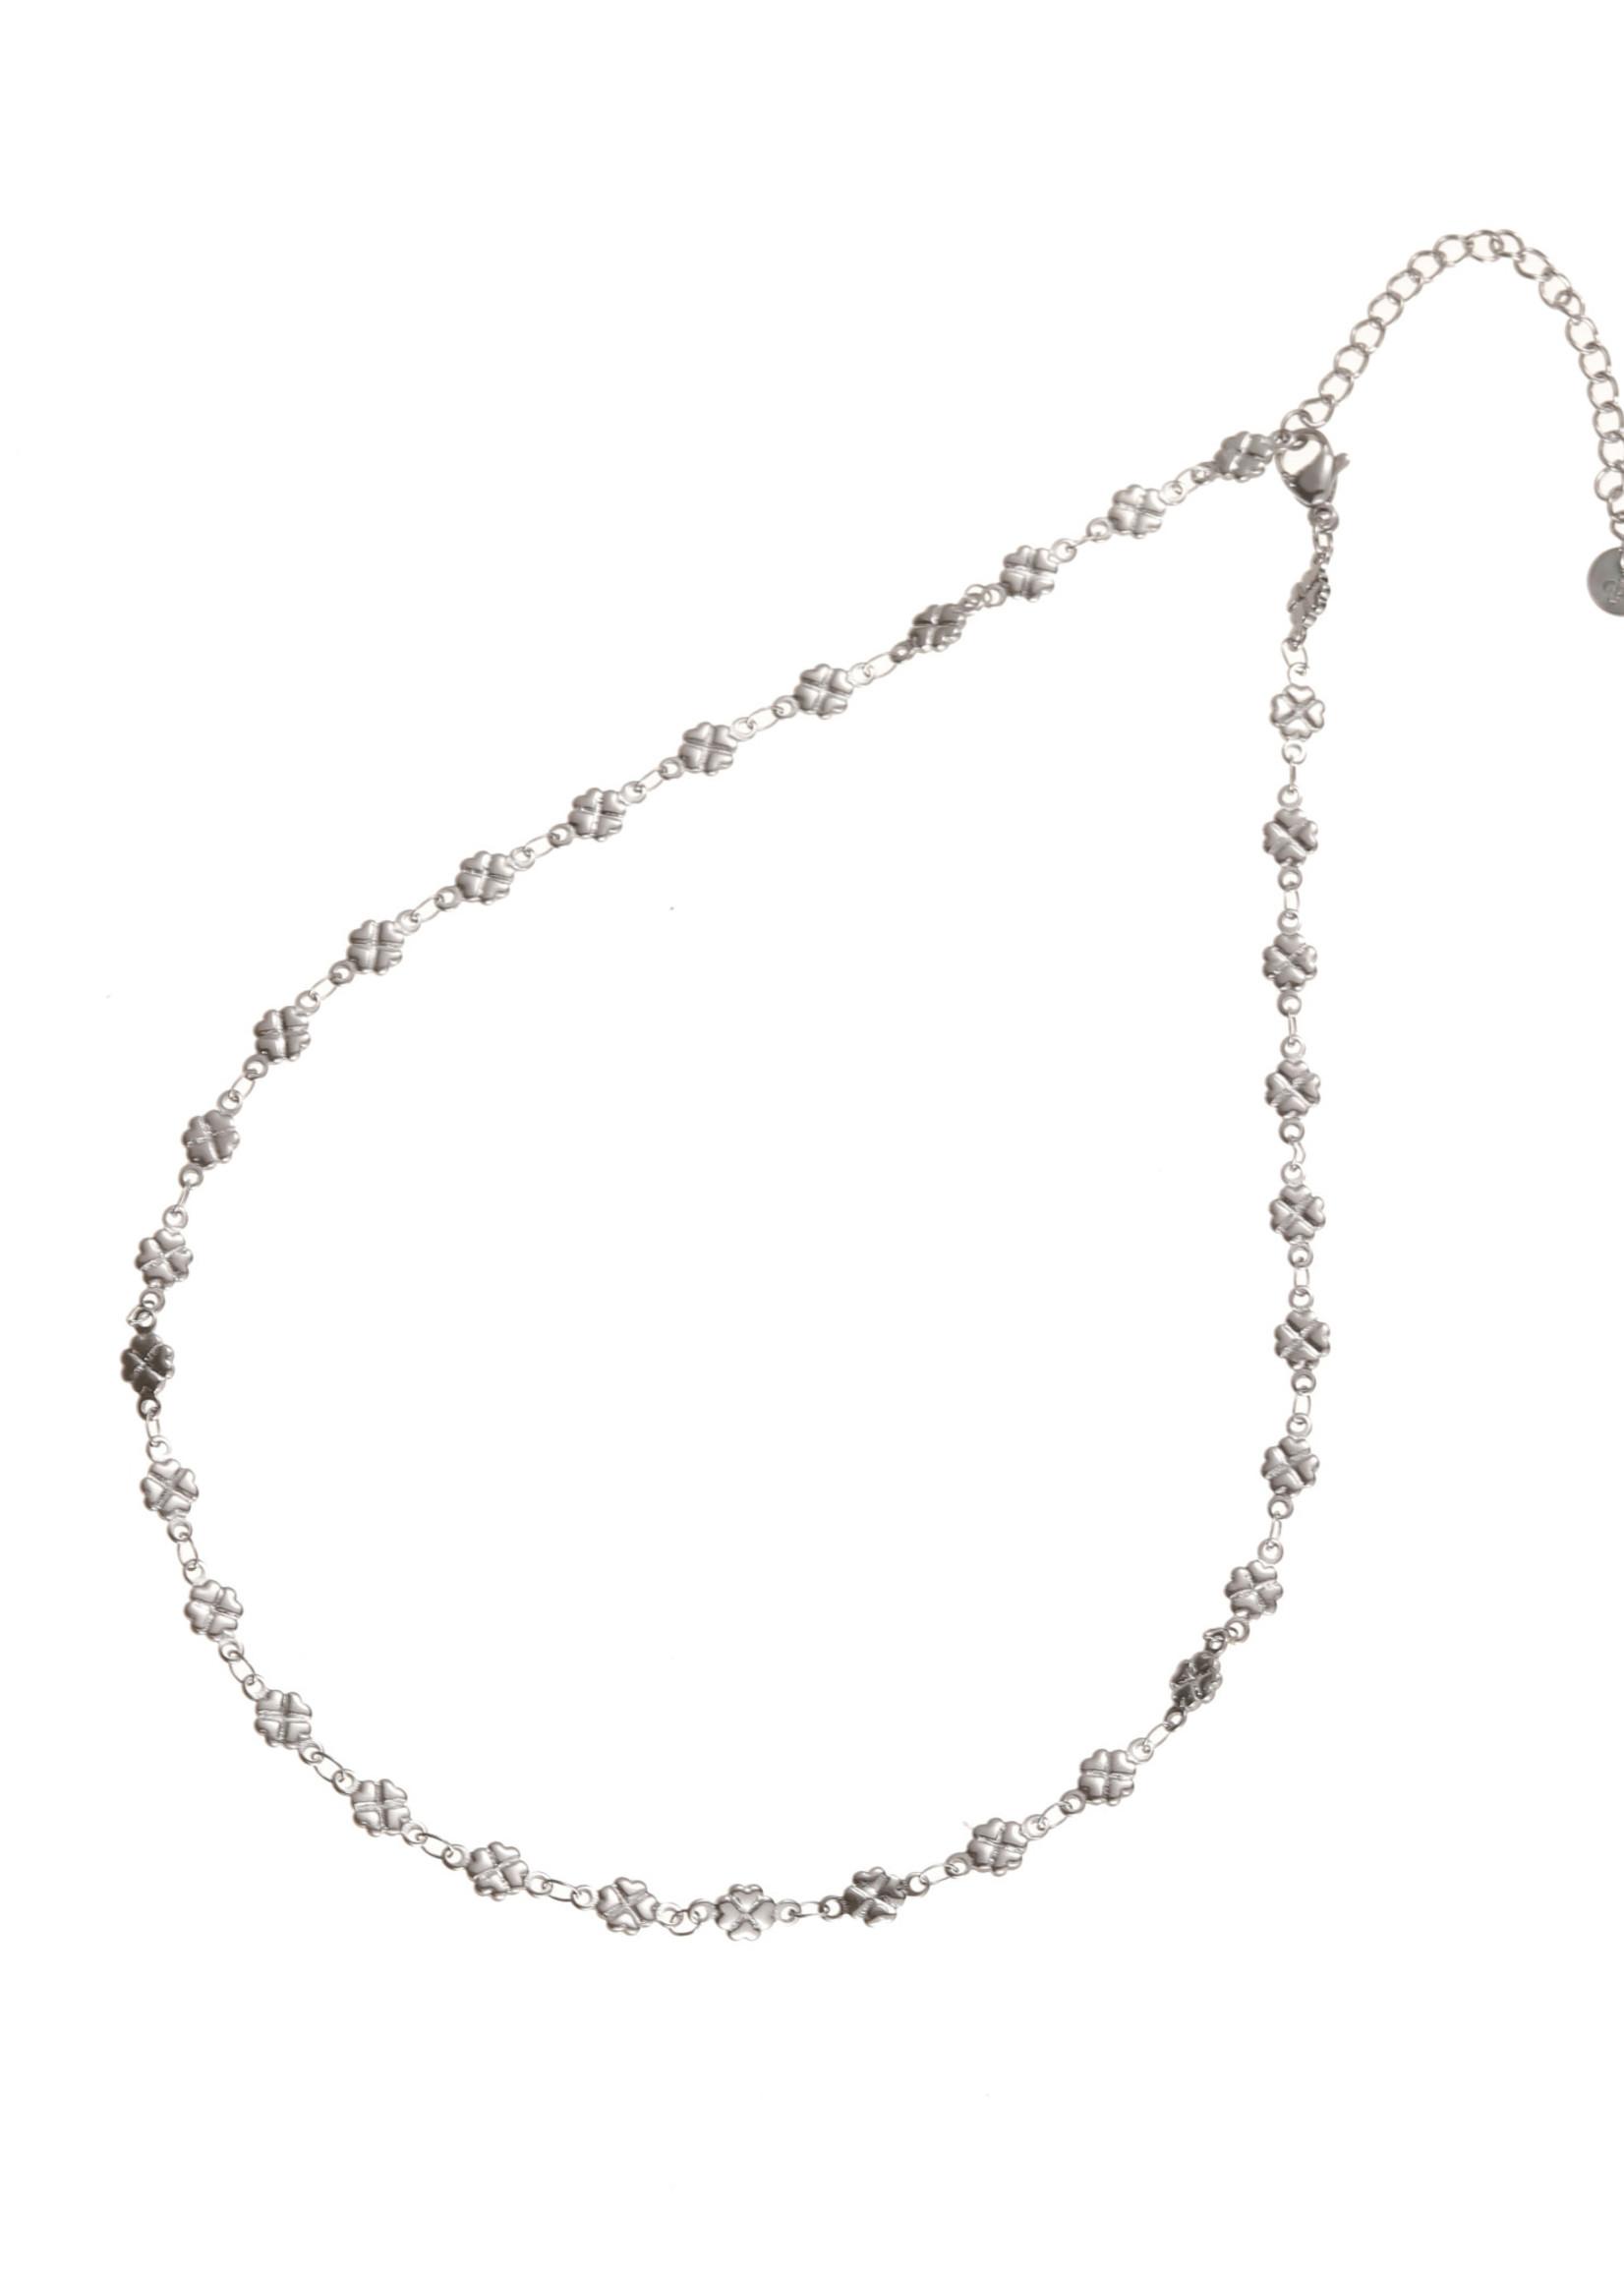 Ketting zilver klavertjesvier N1733-1